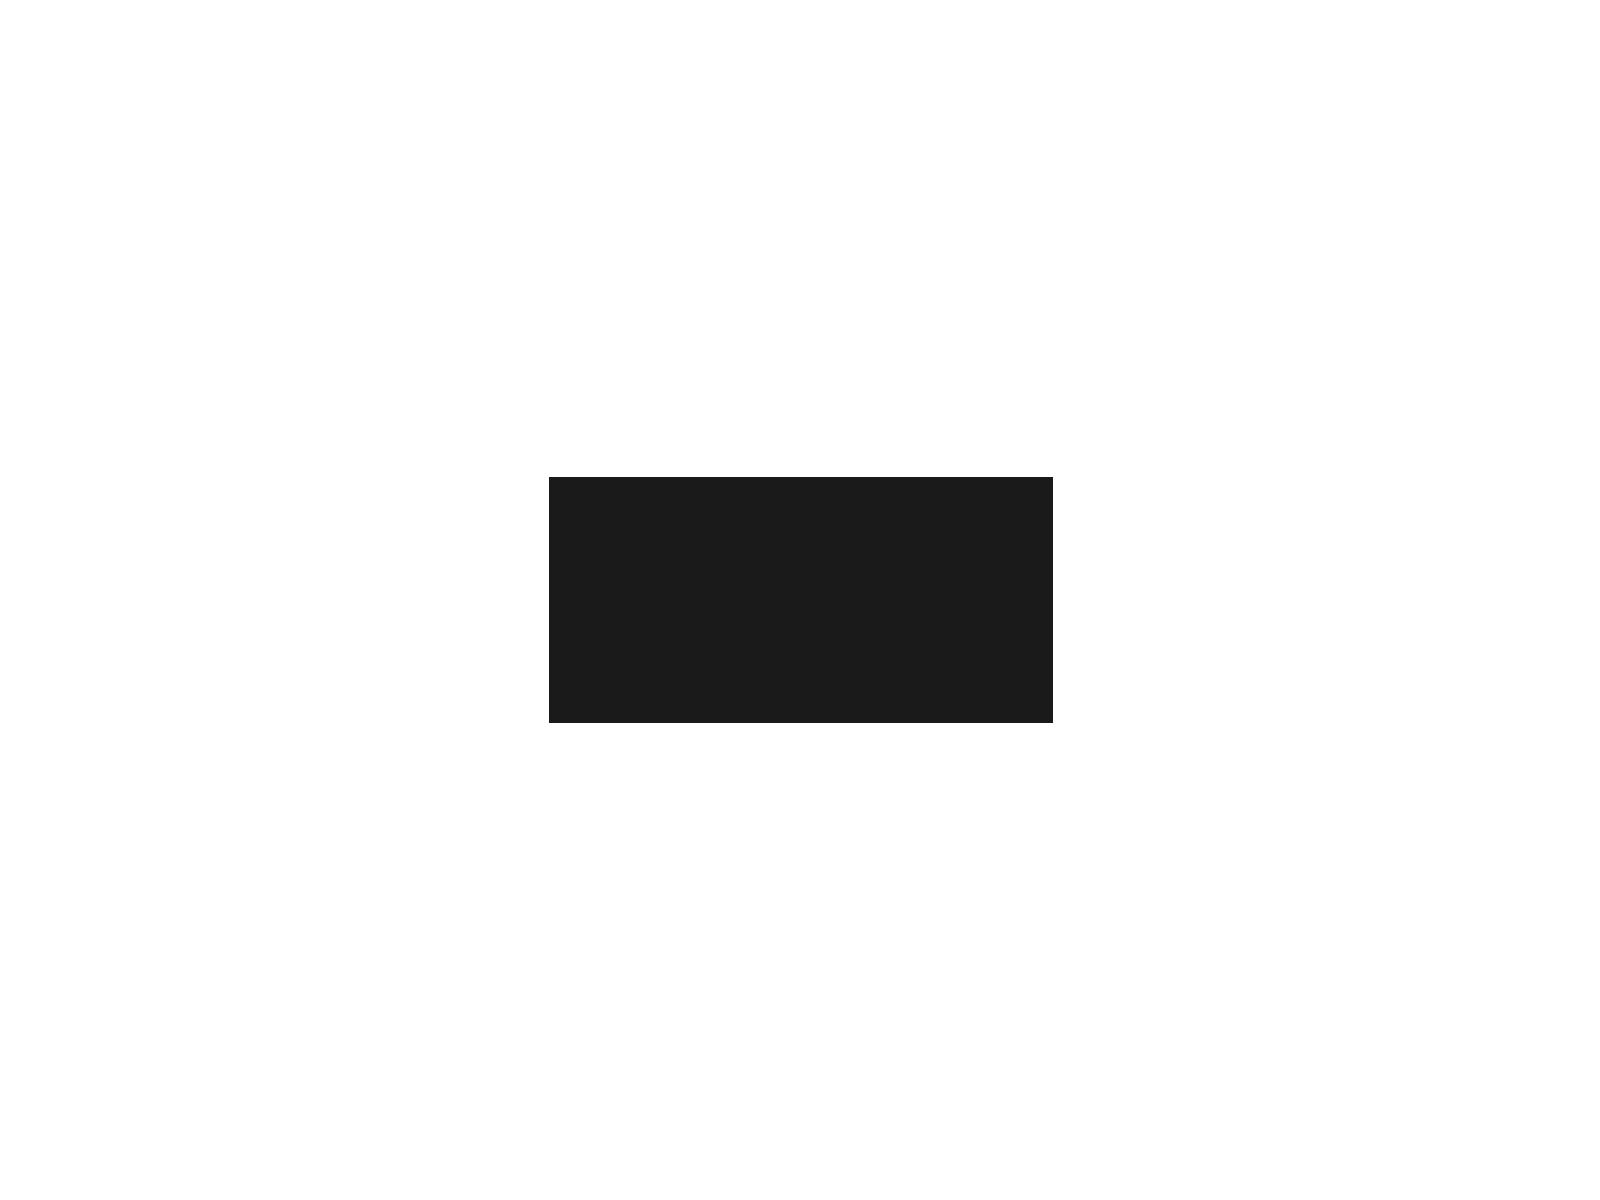 200325_logo_0008_MMM